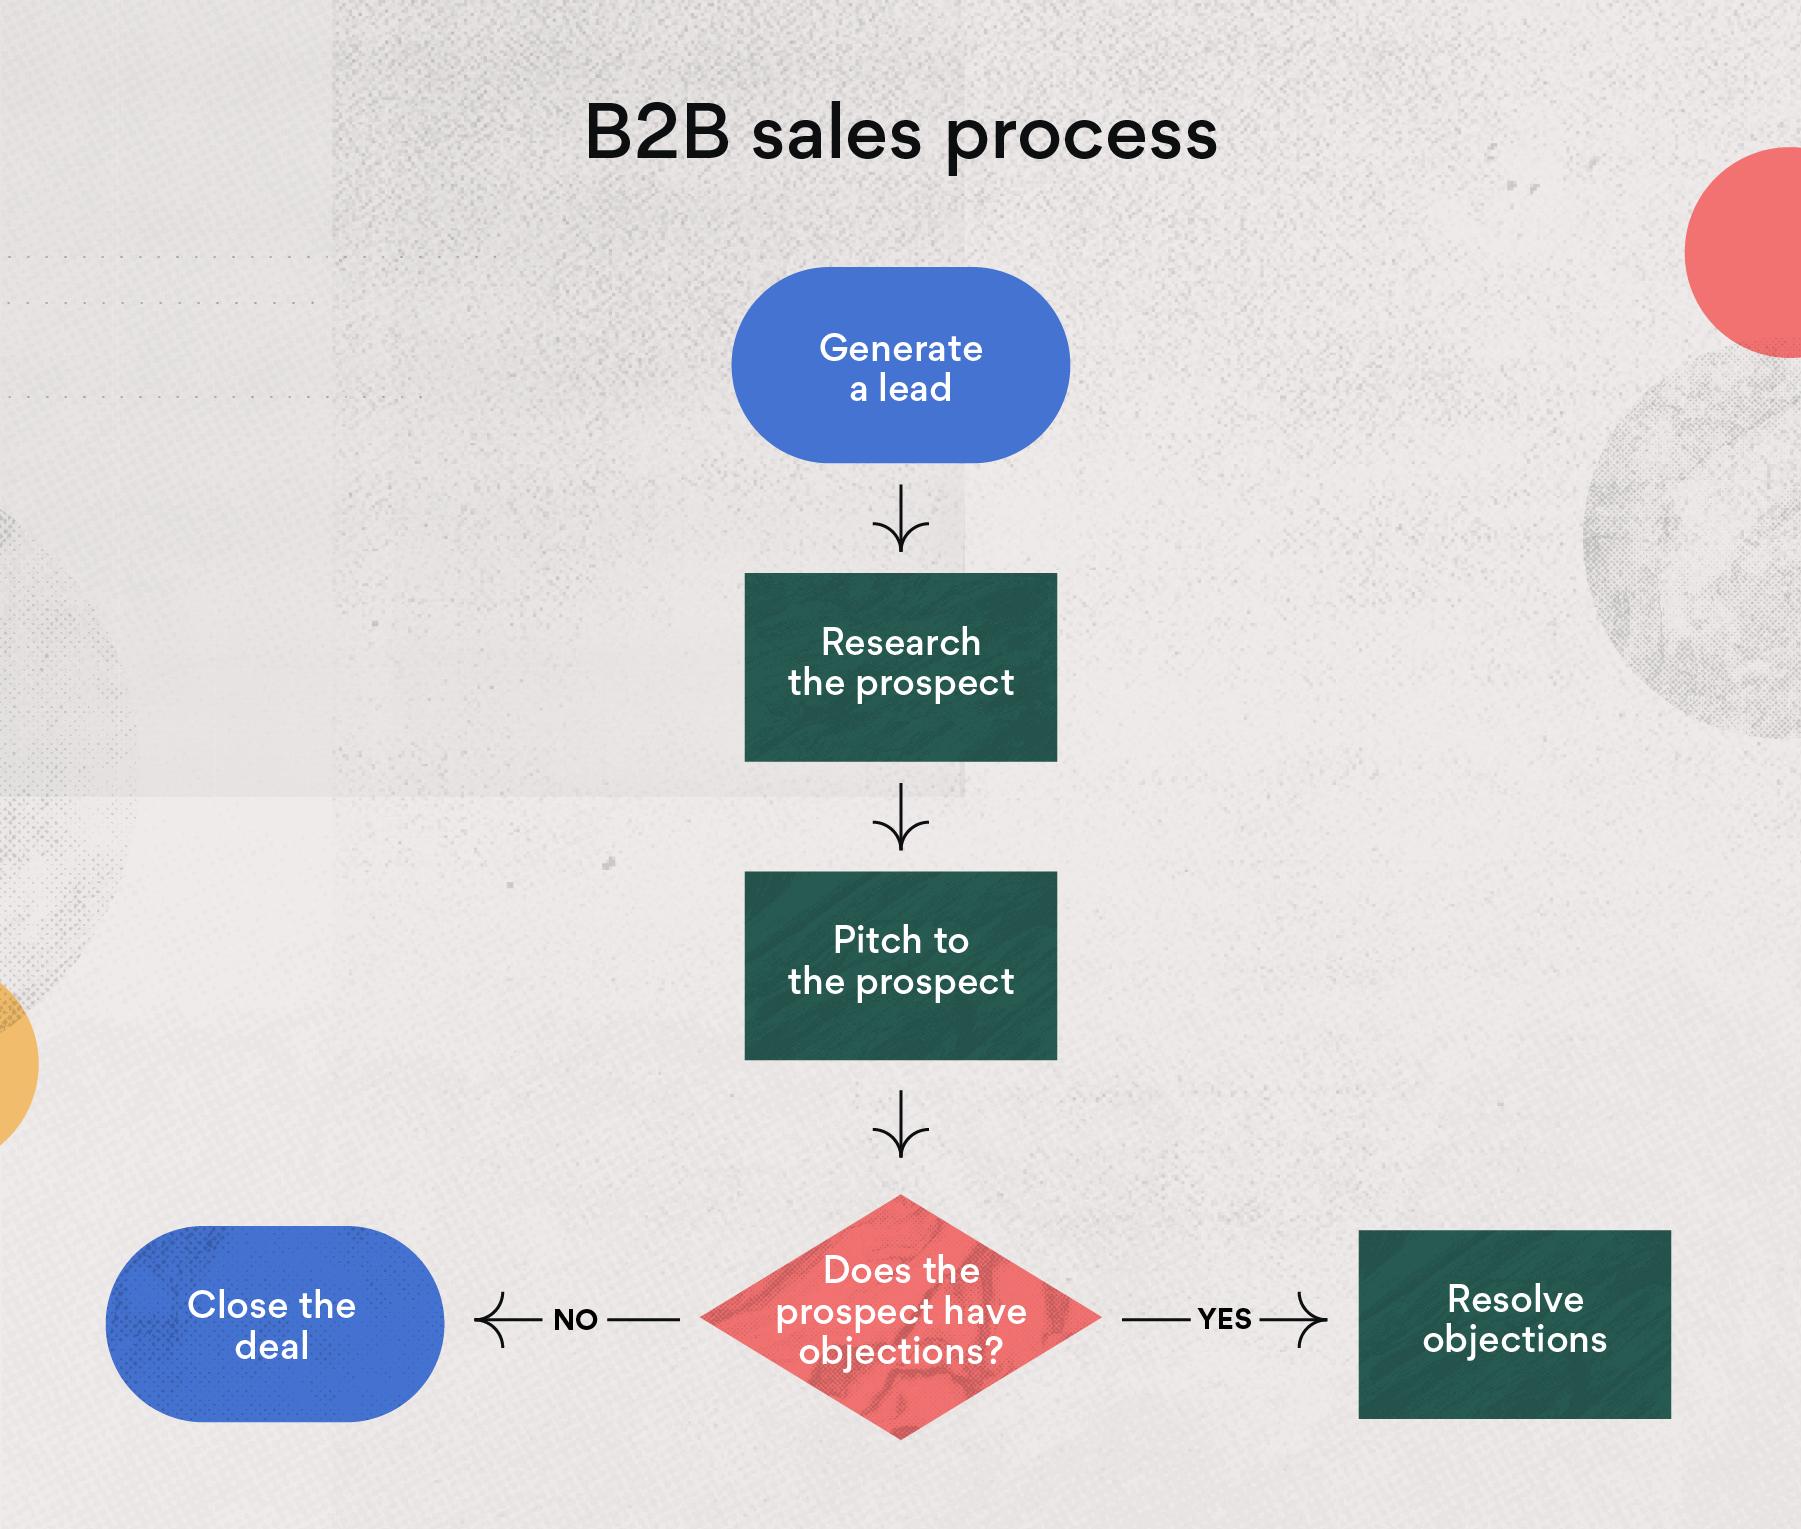 B2B sales process example